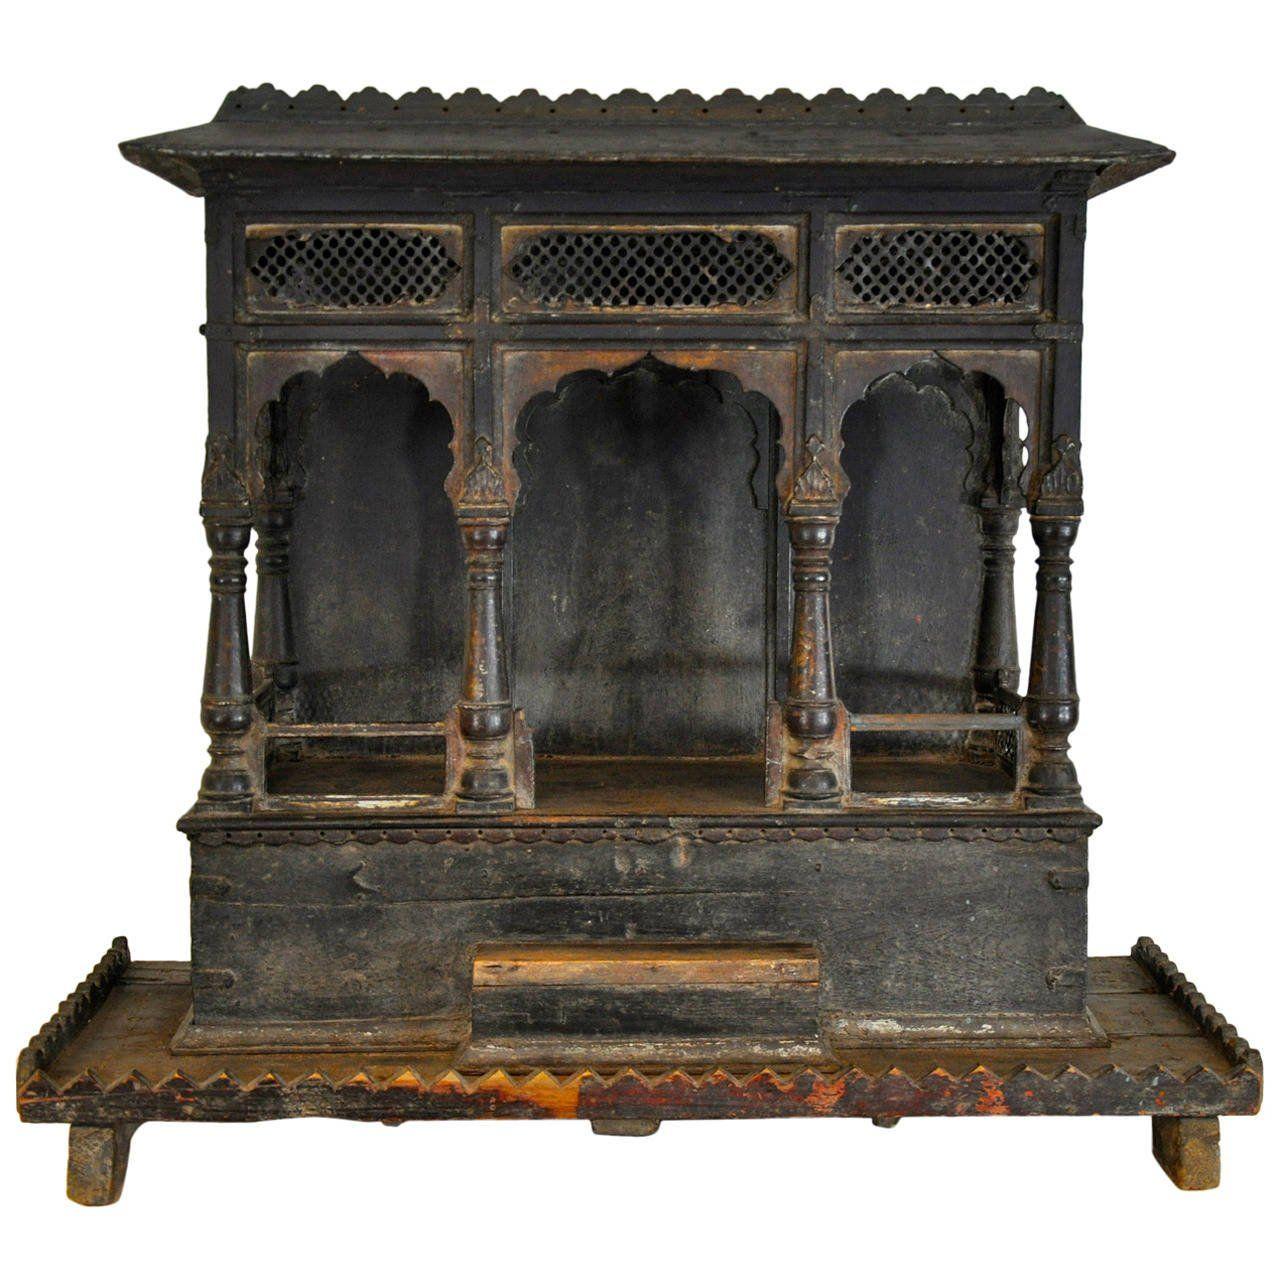 Indian shrine designdreams black and gold pinterest small doors